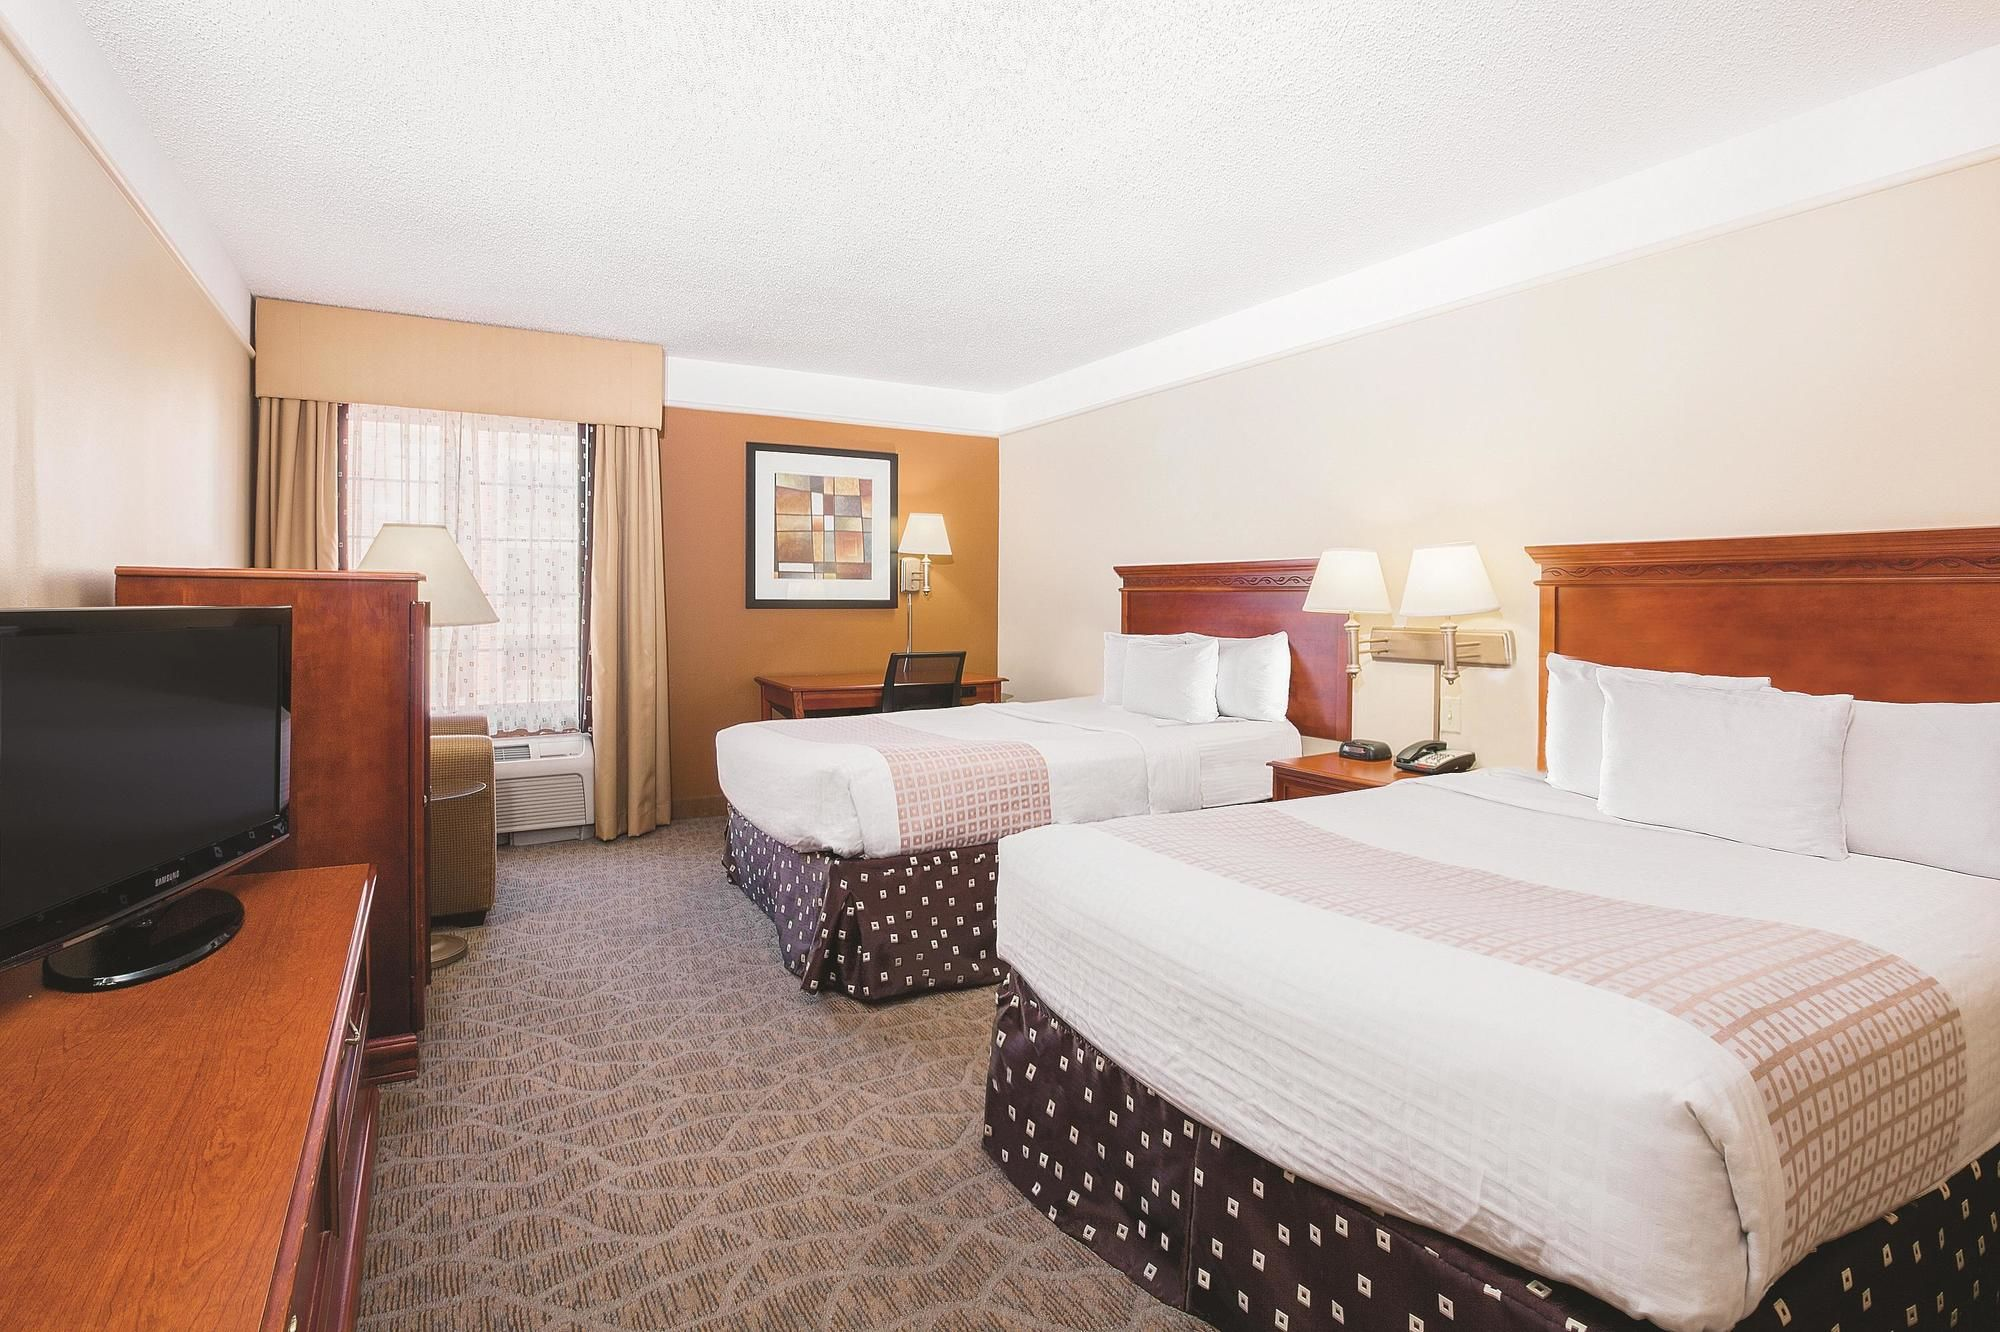 La Quinta Inn & Suites Cincinnati Airport/Florence